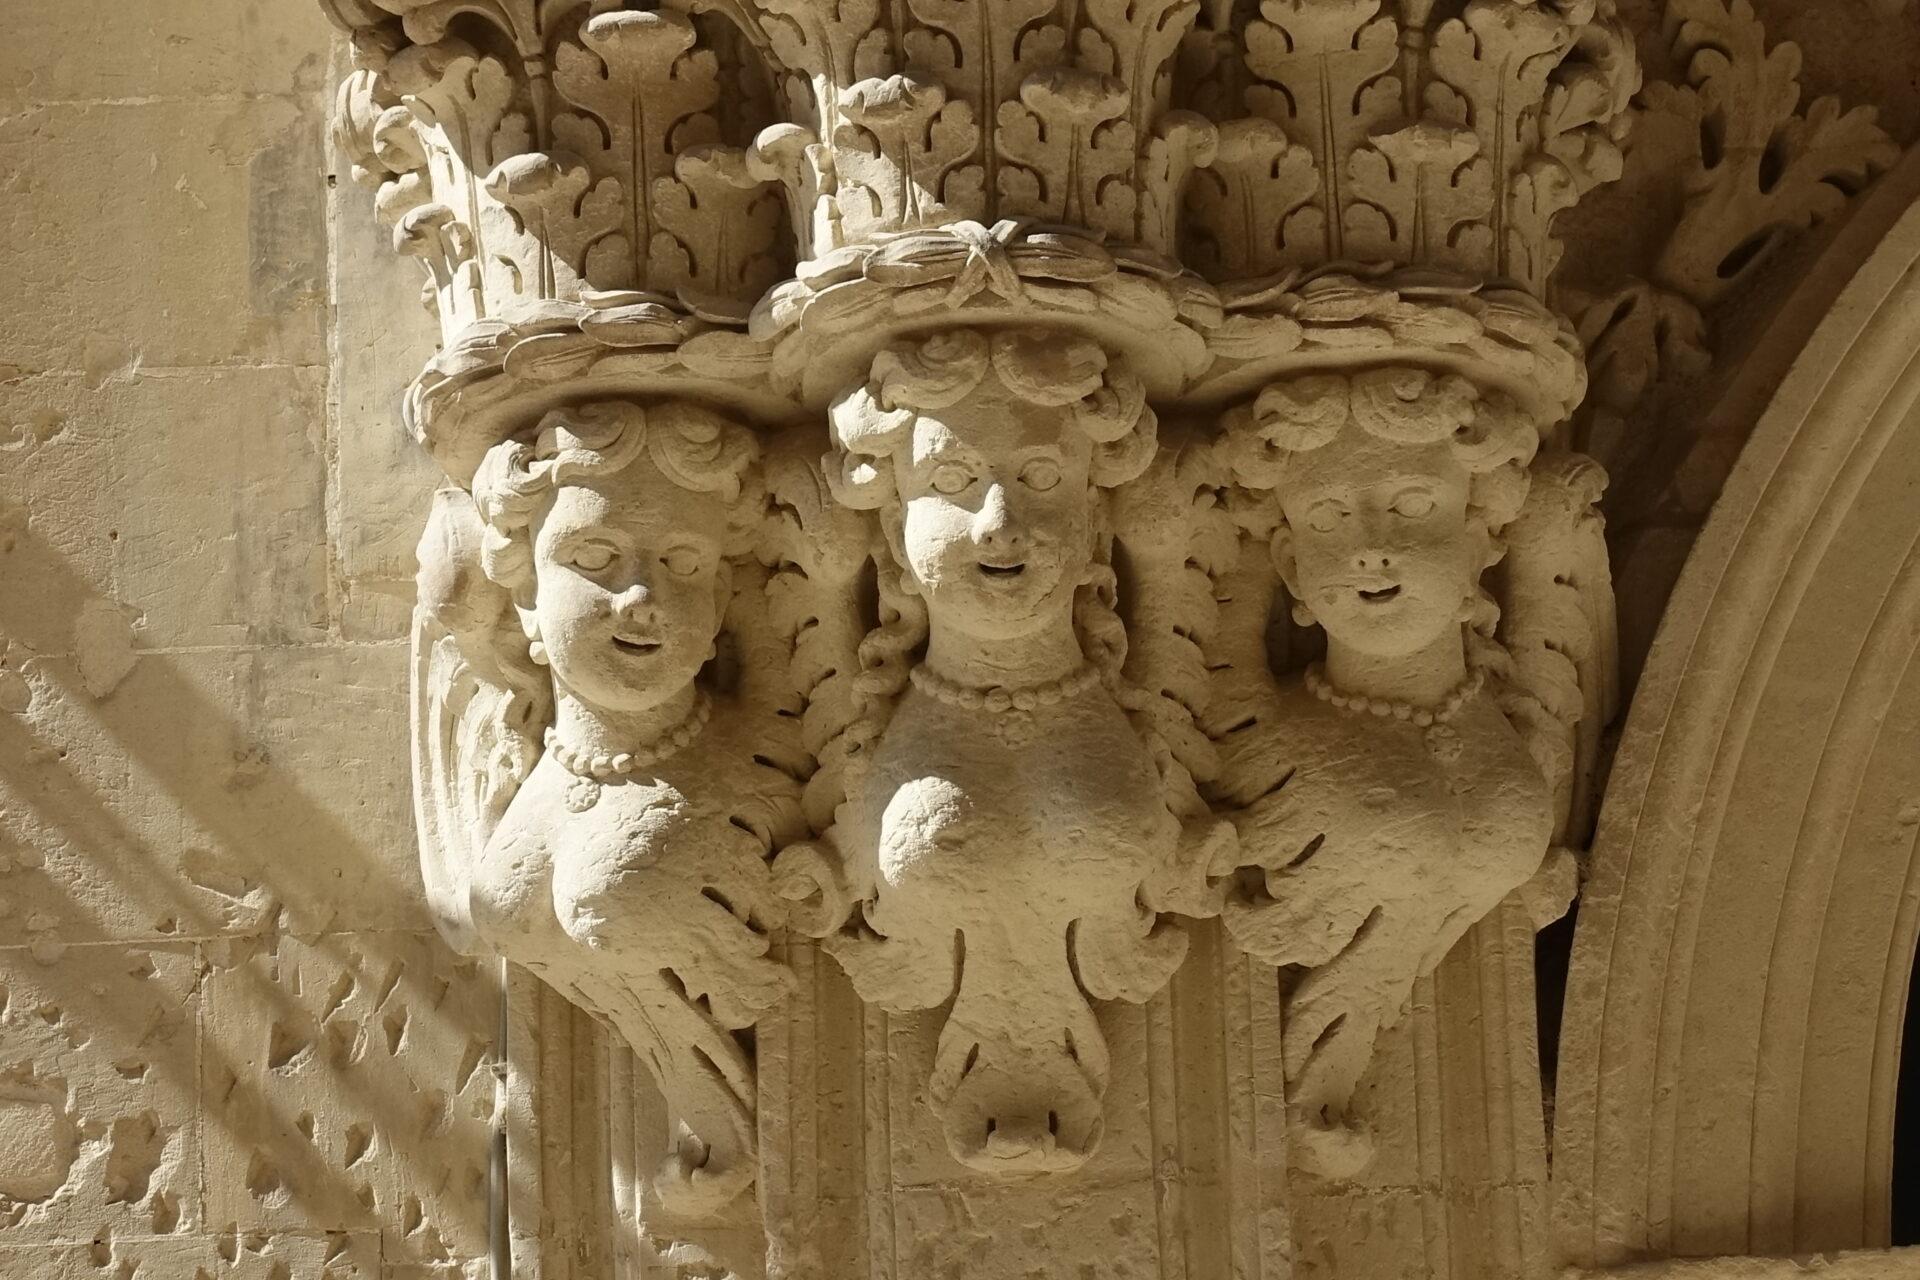 Einzigartiger Barock in Lecce